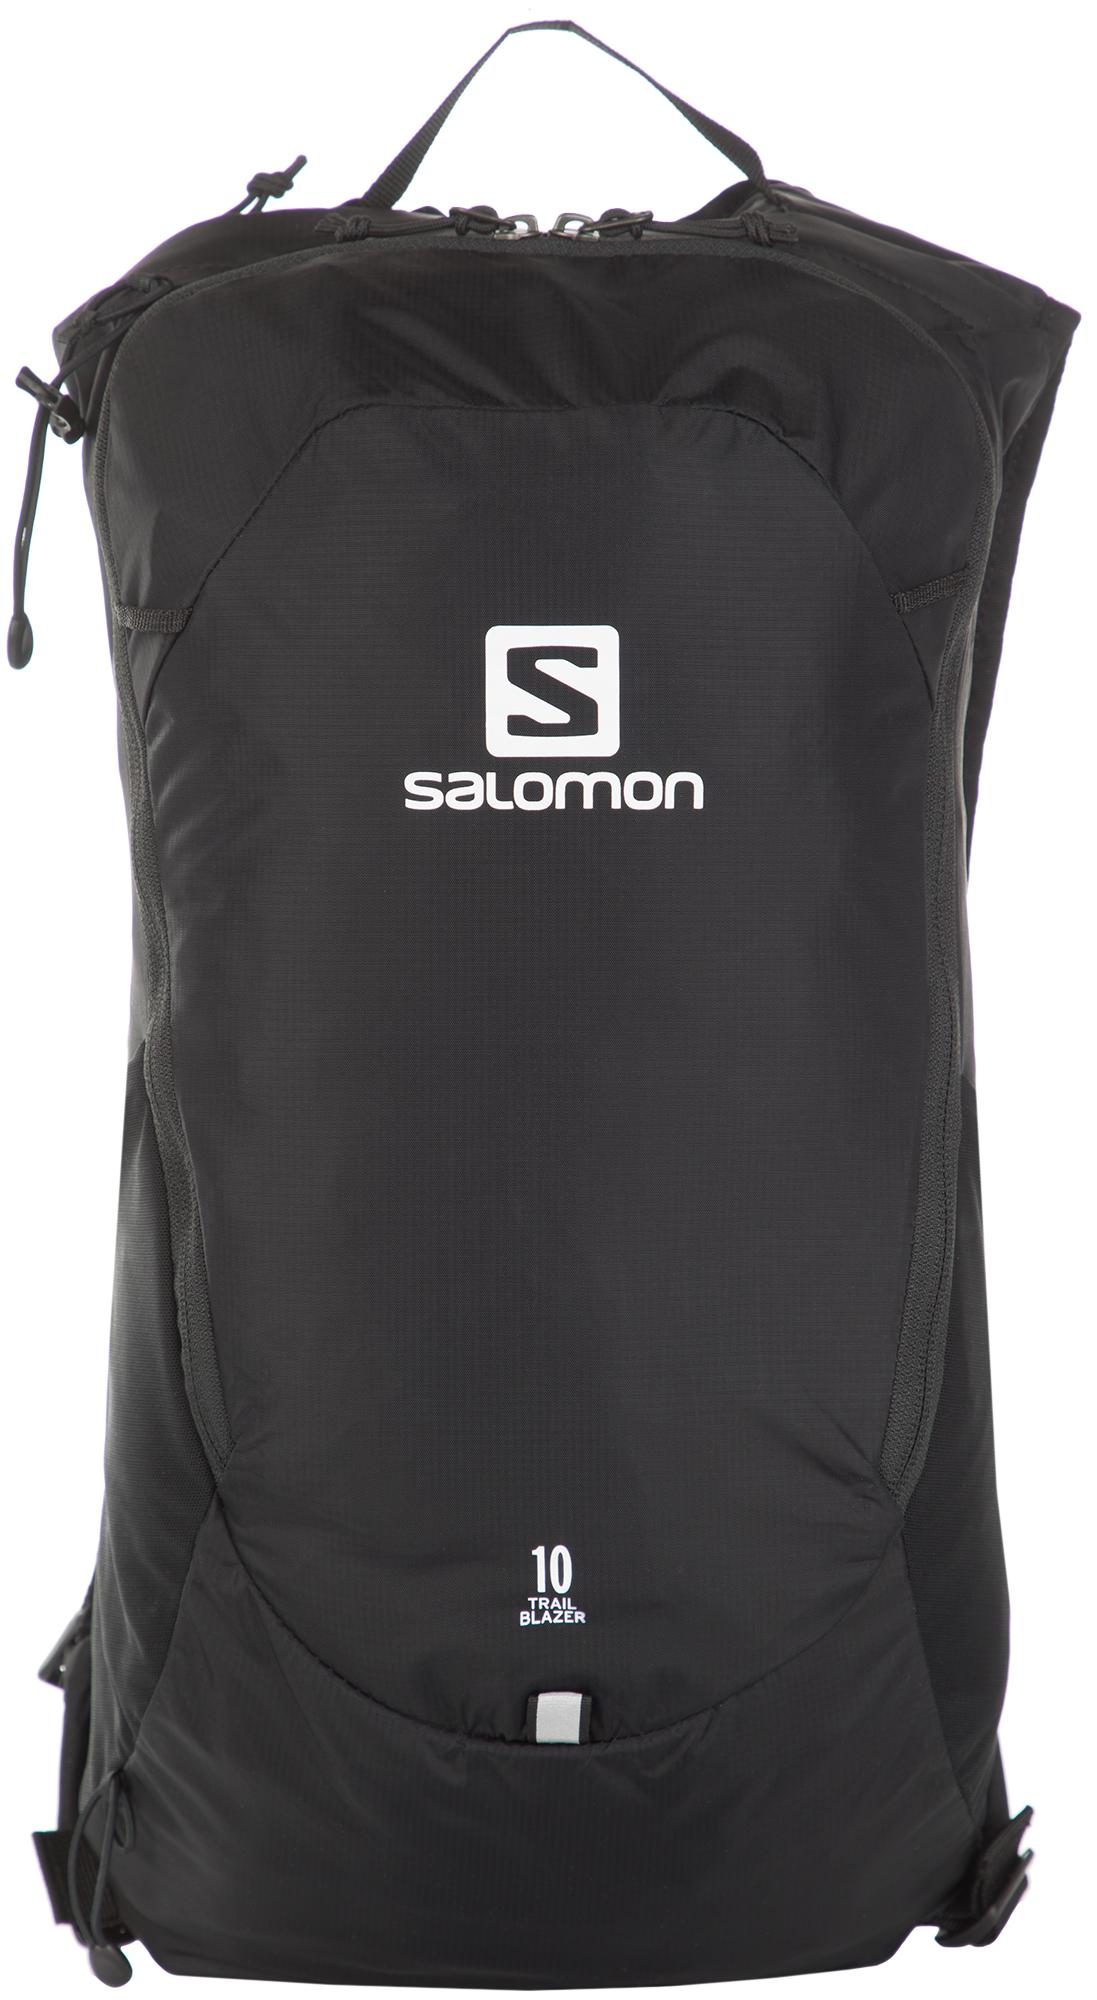 цена на Salomon Рюкзак Salomon Trailblazer 10